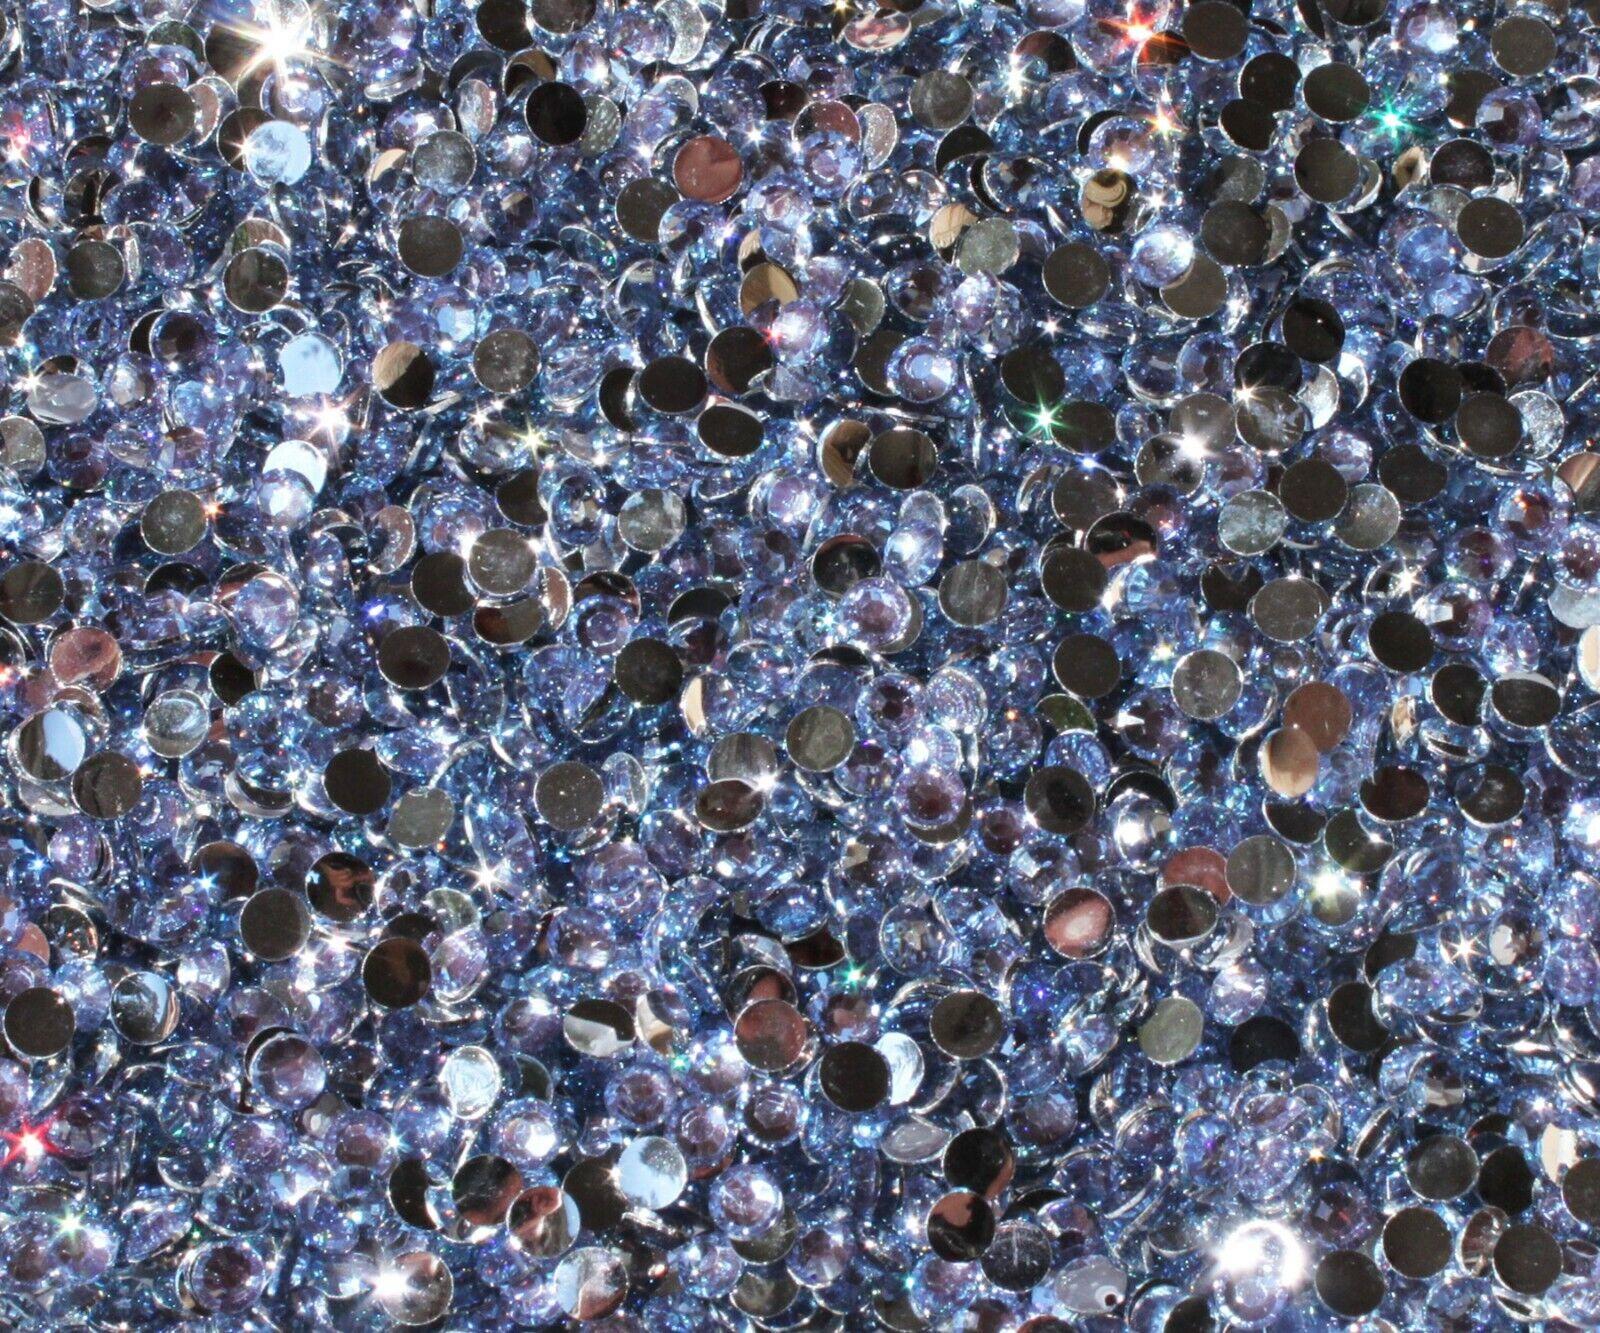 1000 Crystal Flat Back Resin Rhinestones Gems 60 colors, 2mm, 3mm, 4mm, 5mm, 6.5 LIGHT SAPPHIRE